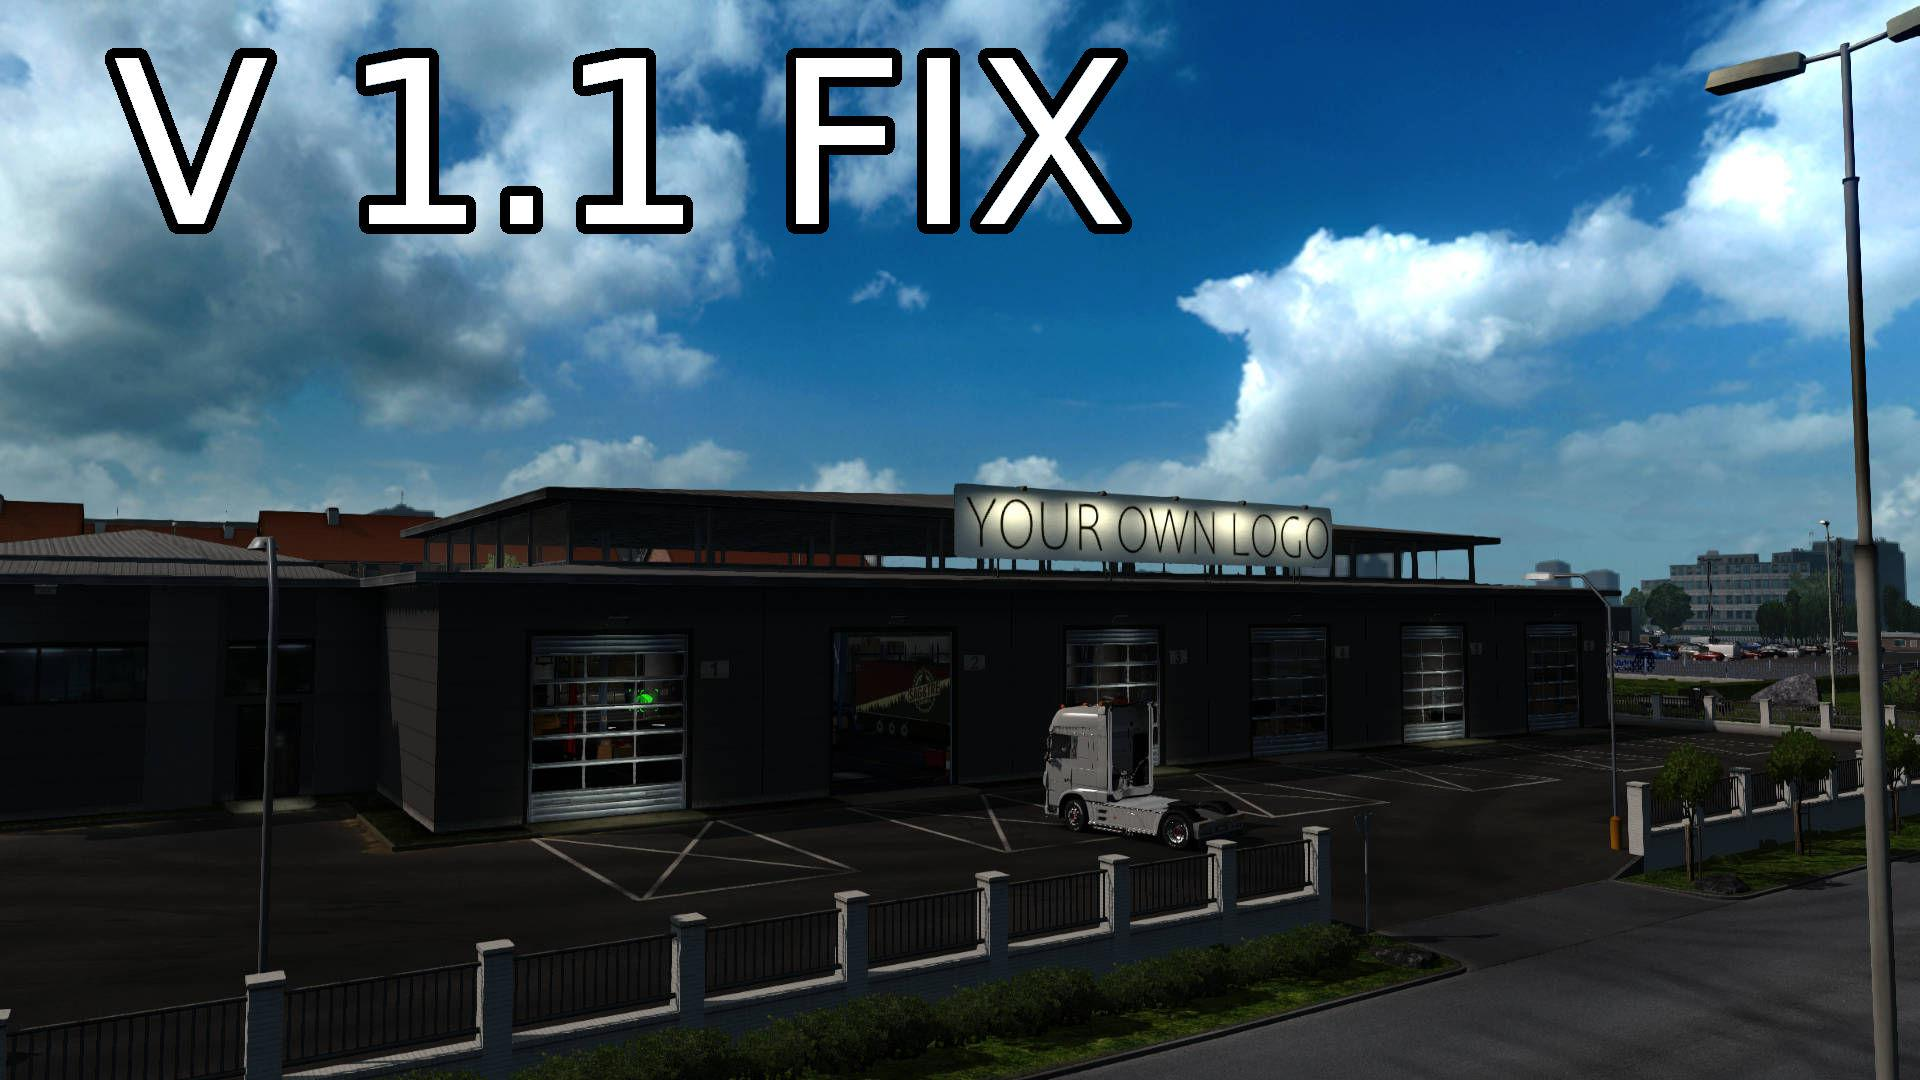 ETS2 - Your Own Garage V1.1 Fix (1.36.x)